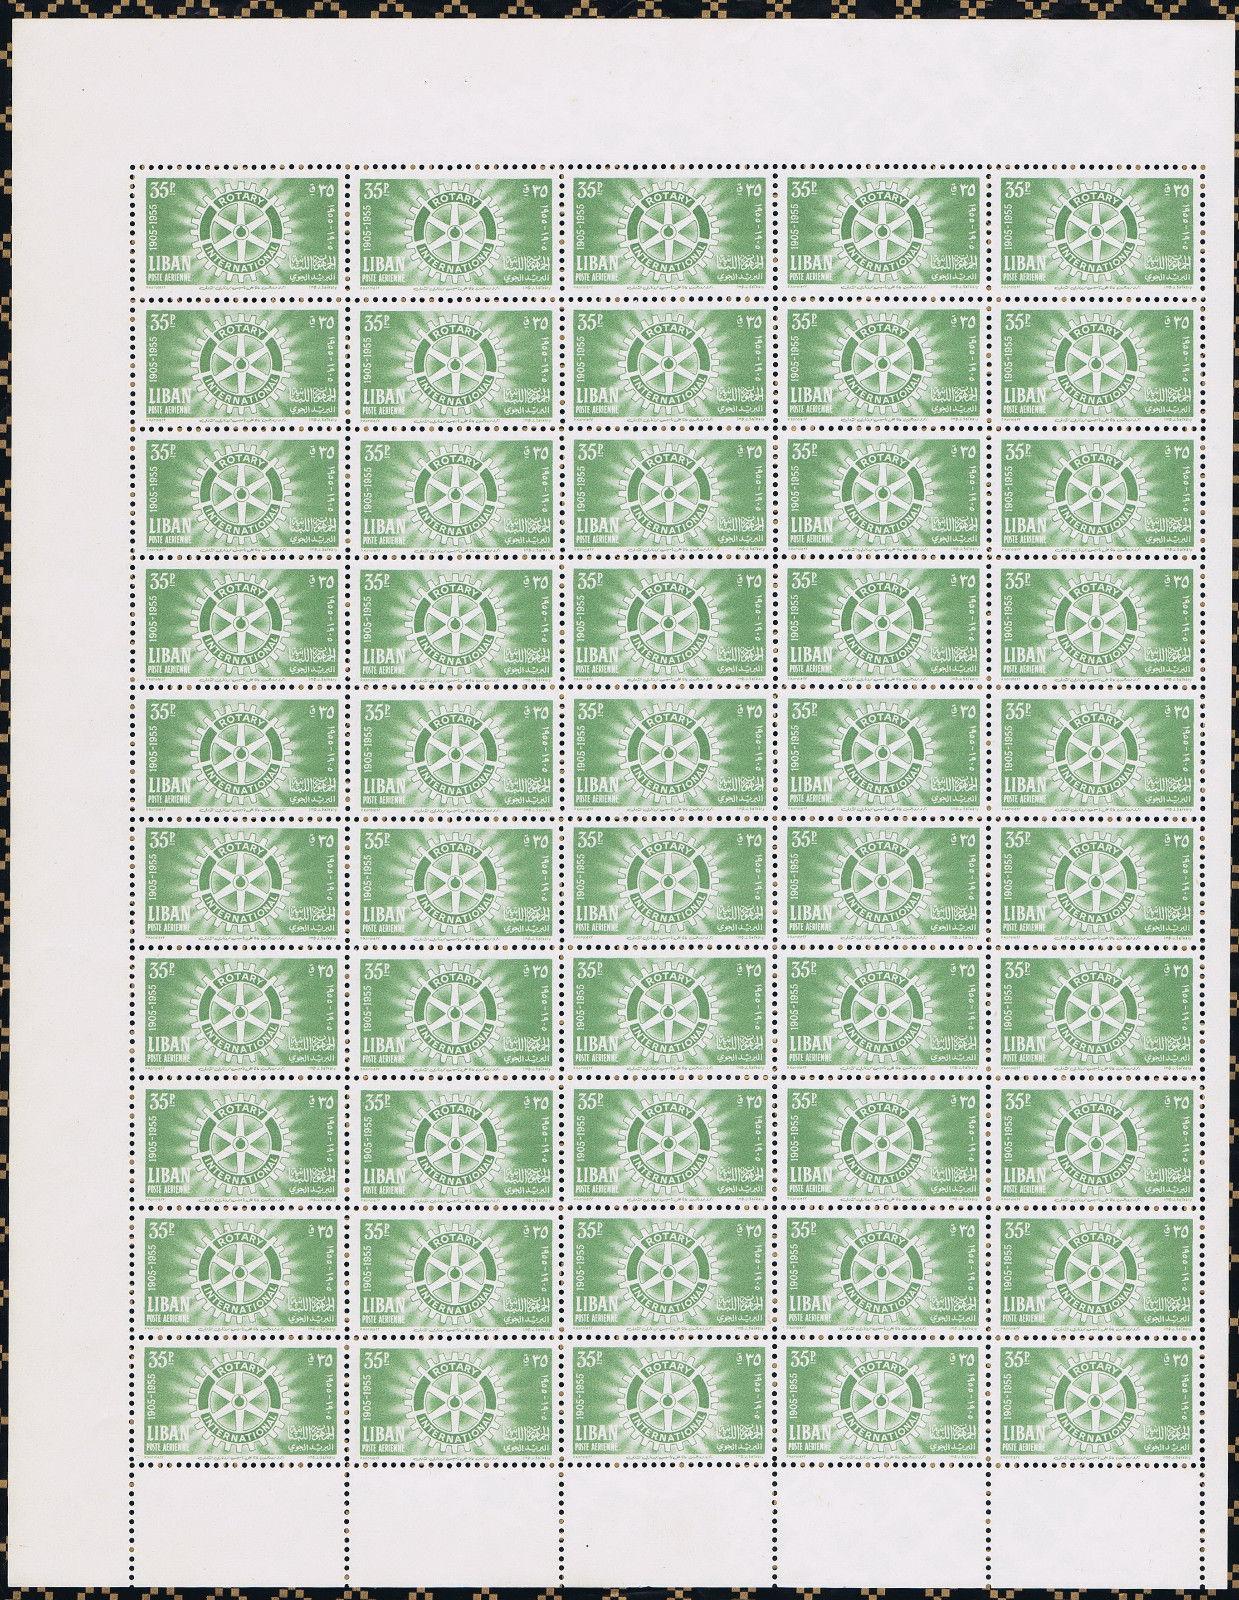 1955 Rotary International 35p